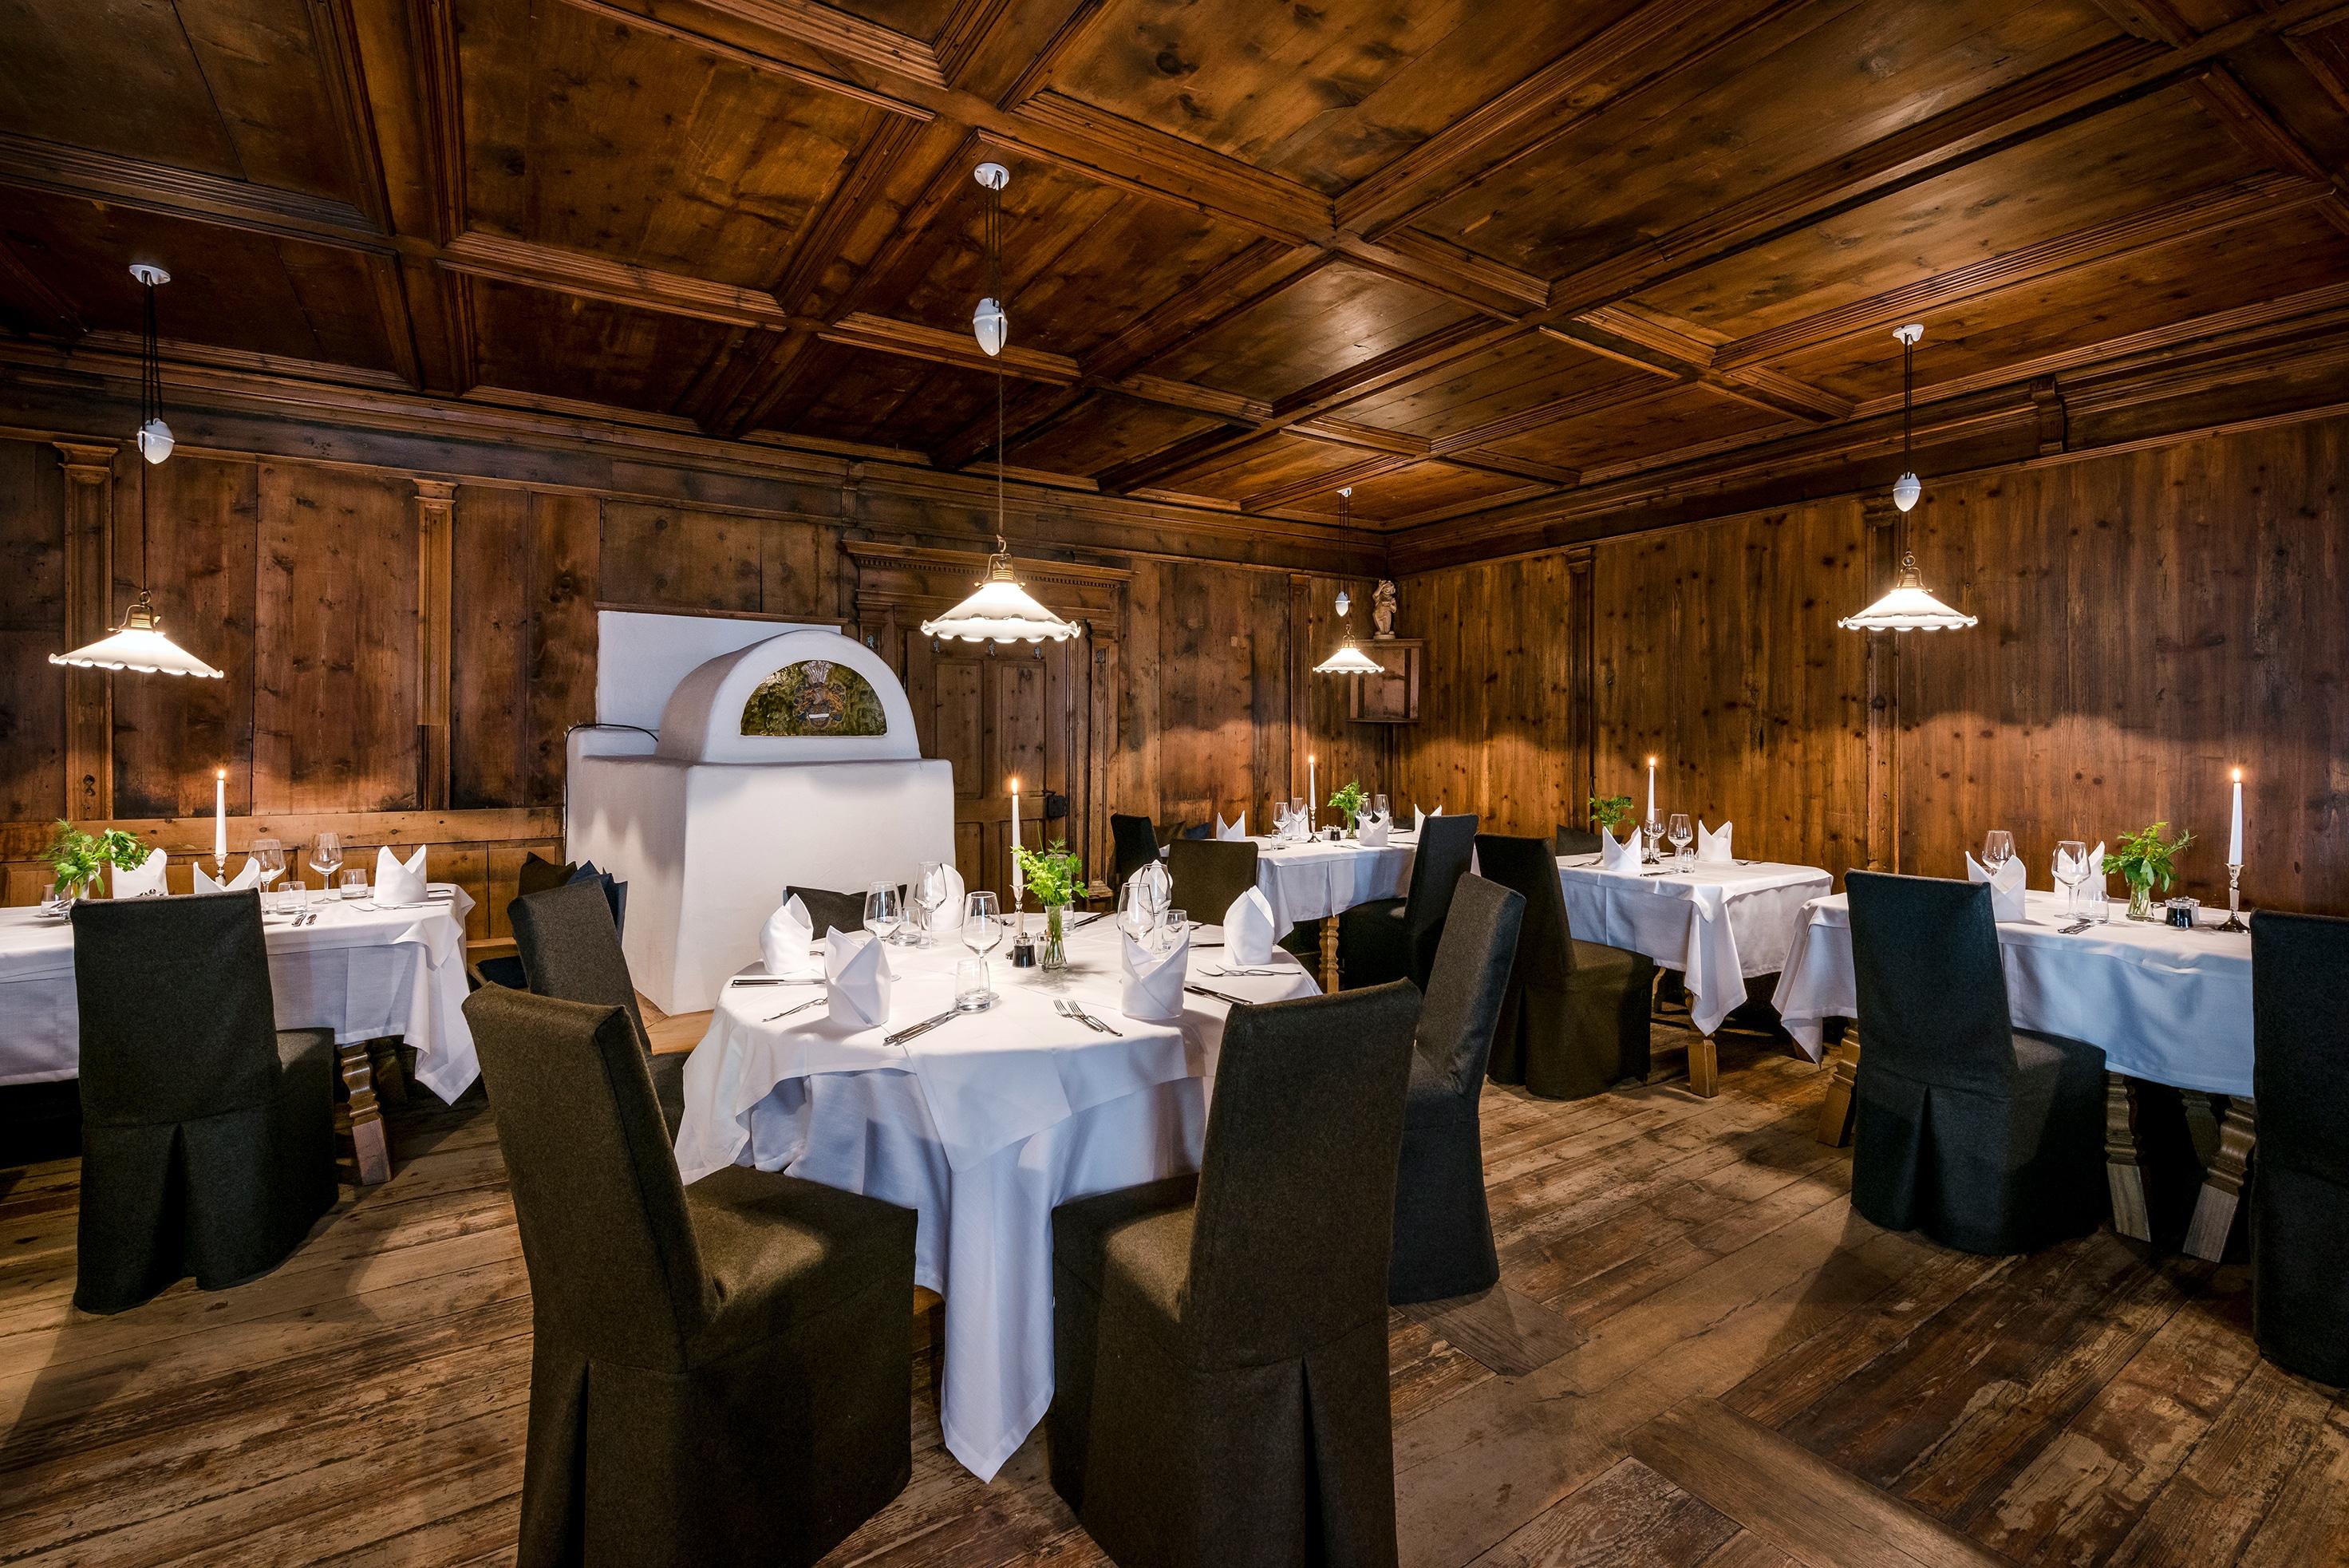 Hotel Botango Thedl Bauernstube